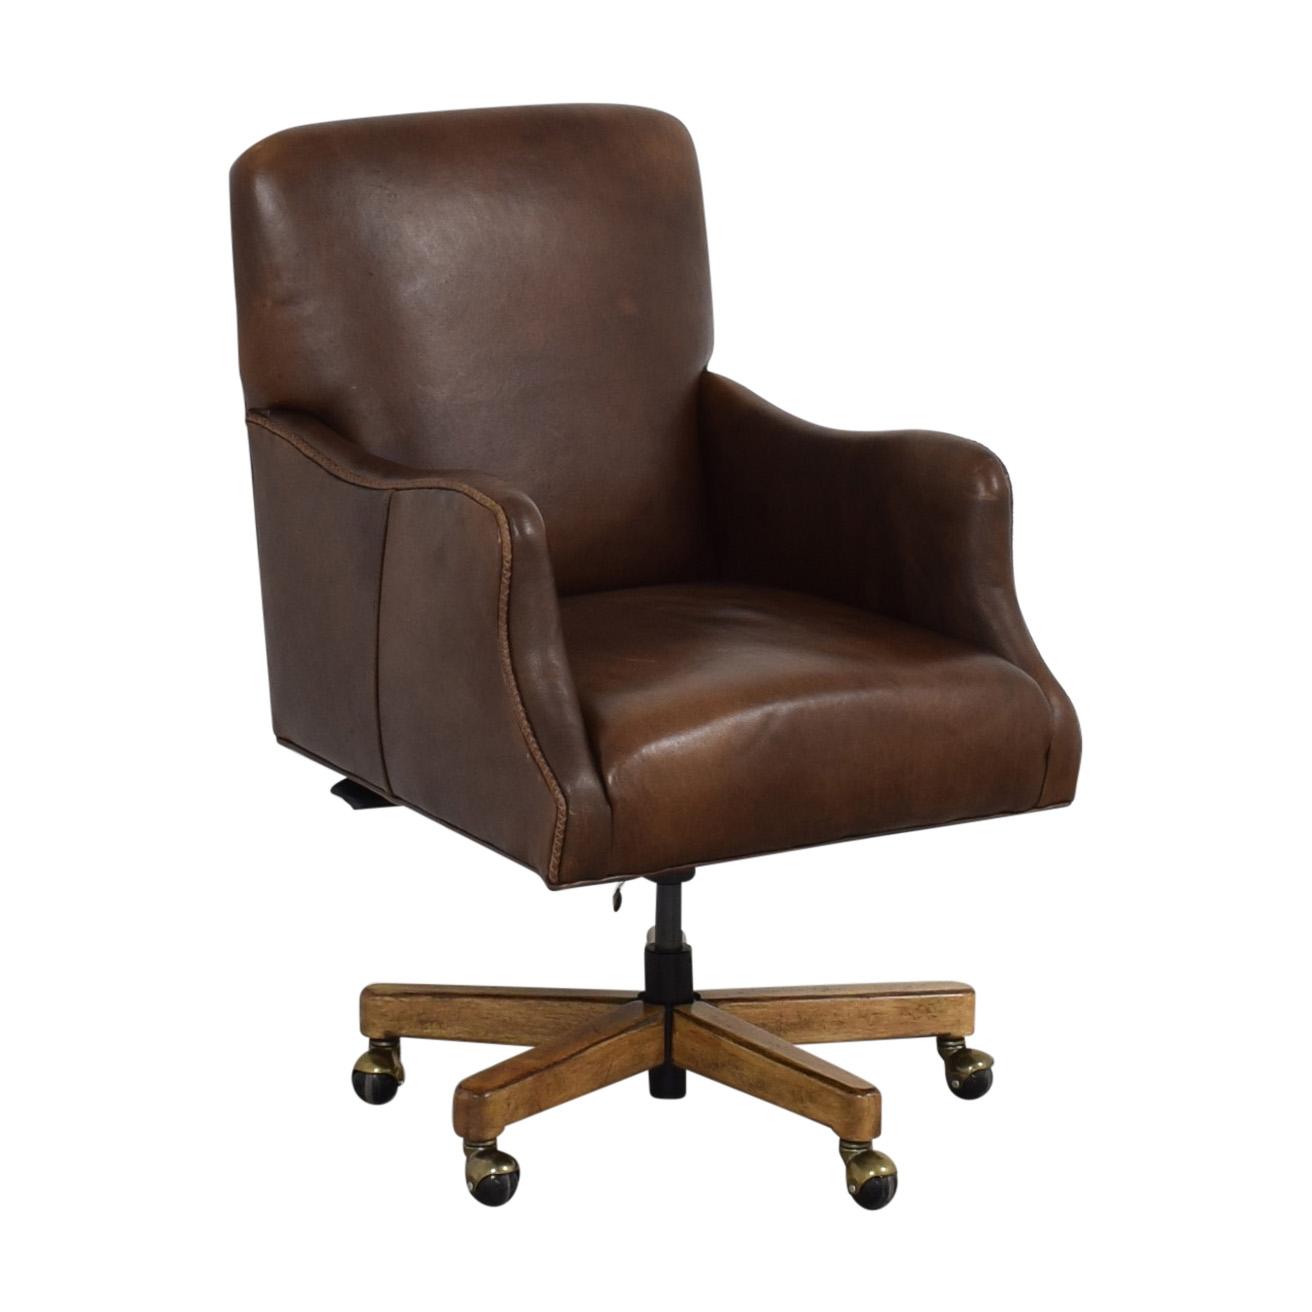 Hooker Furniture Hooker Furniture Office Chair brown